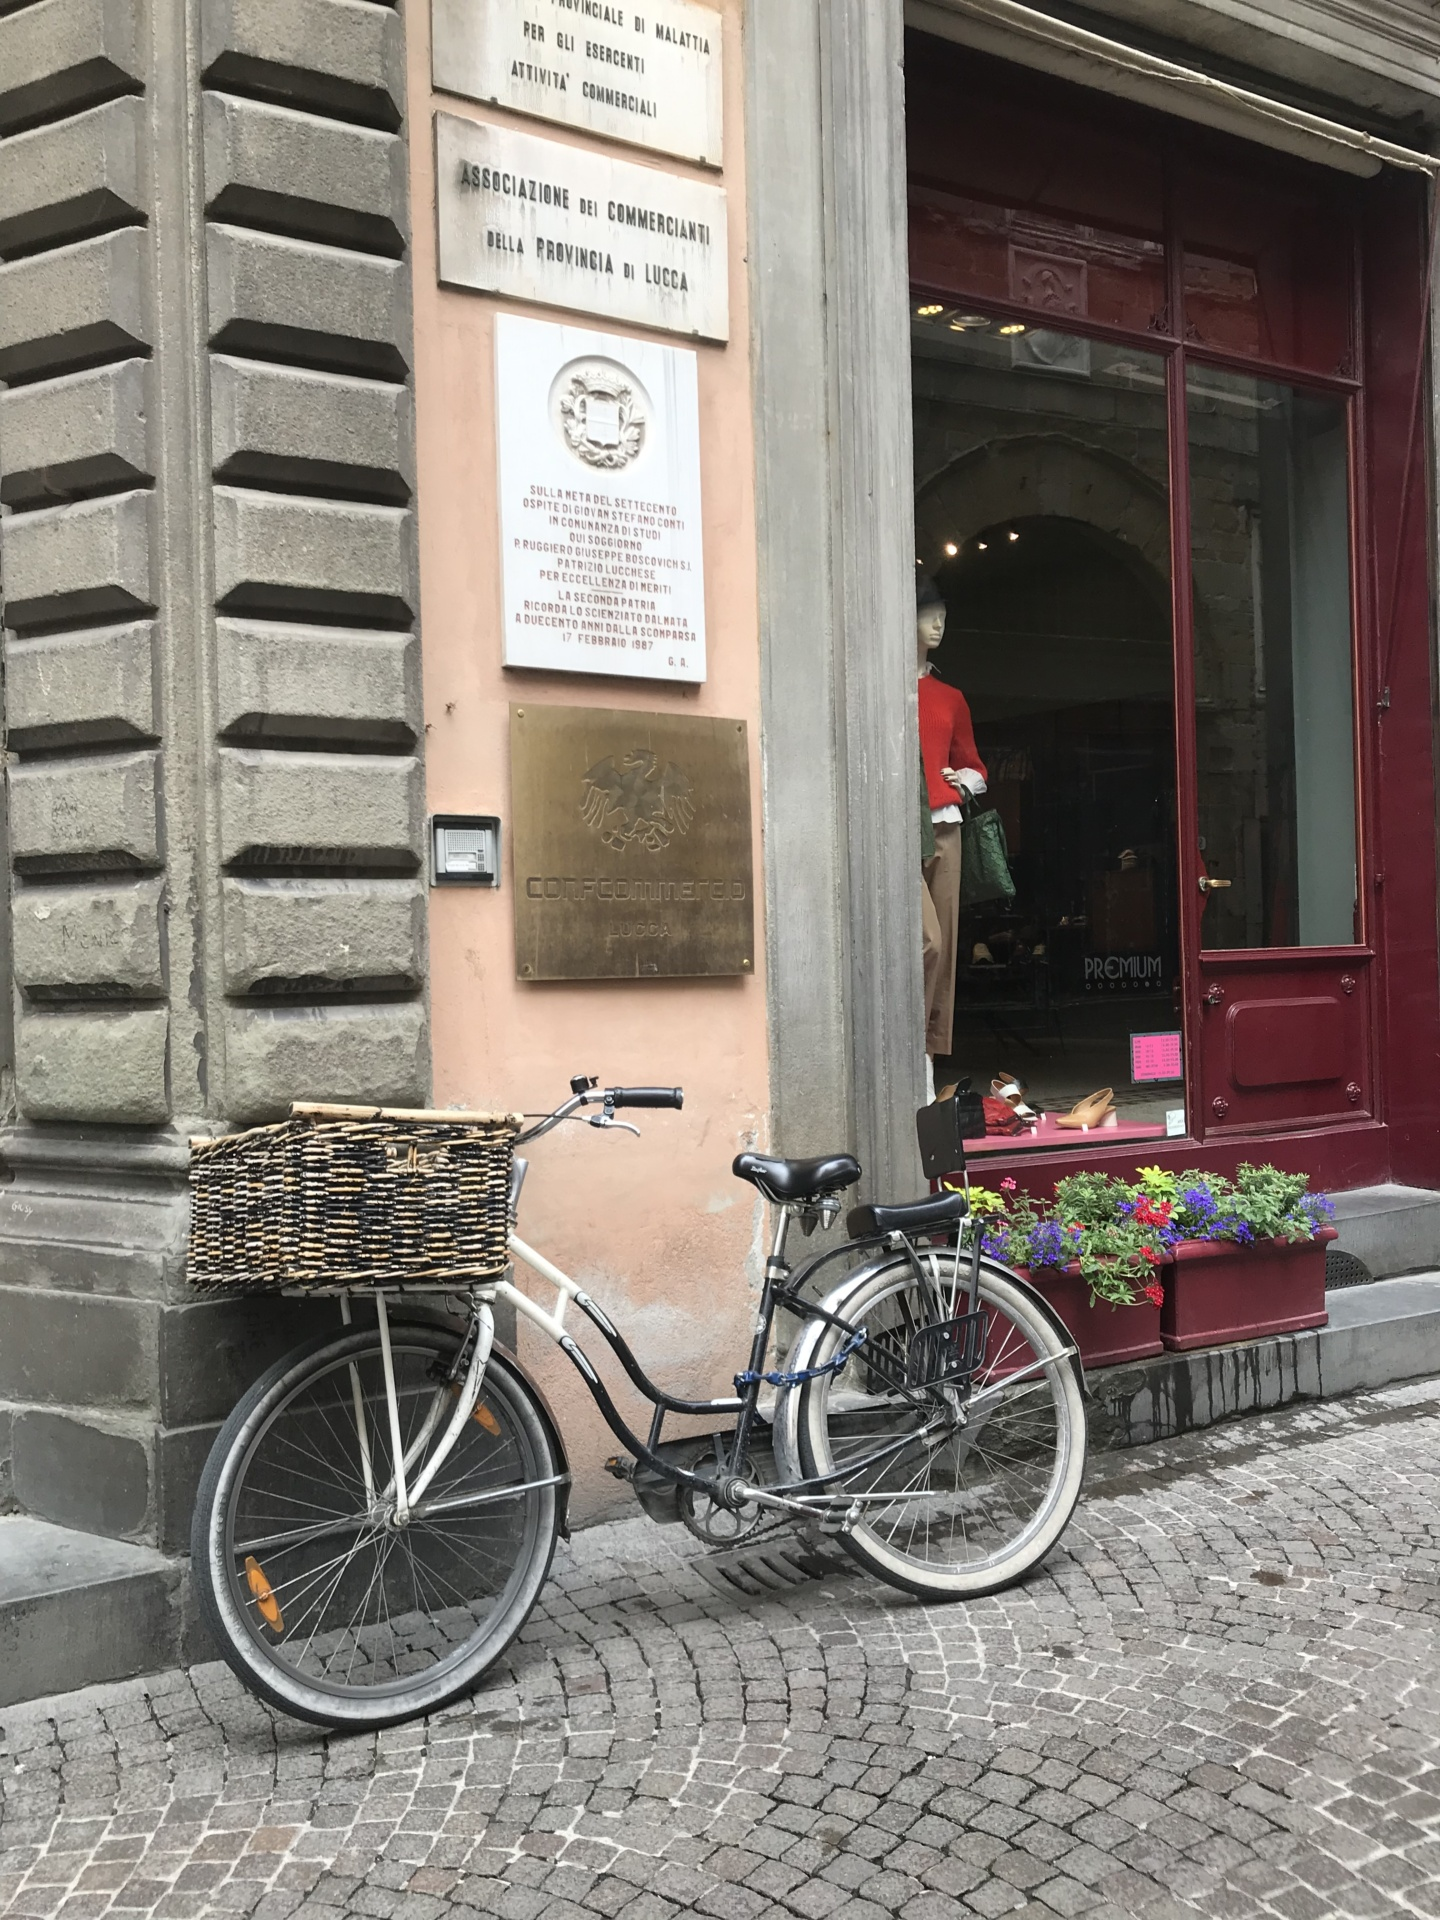 Wanderlustbee, Lucca, Italy